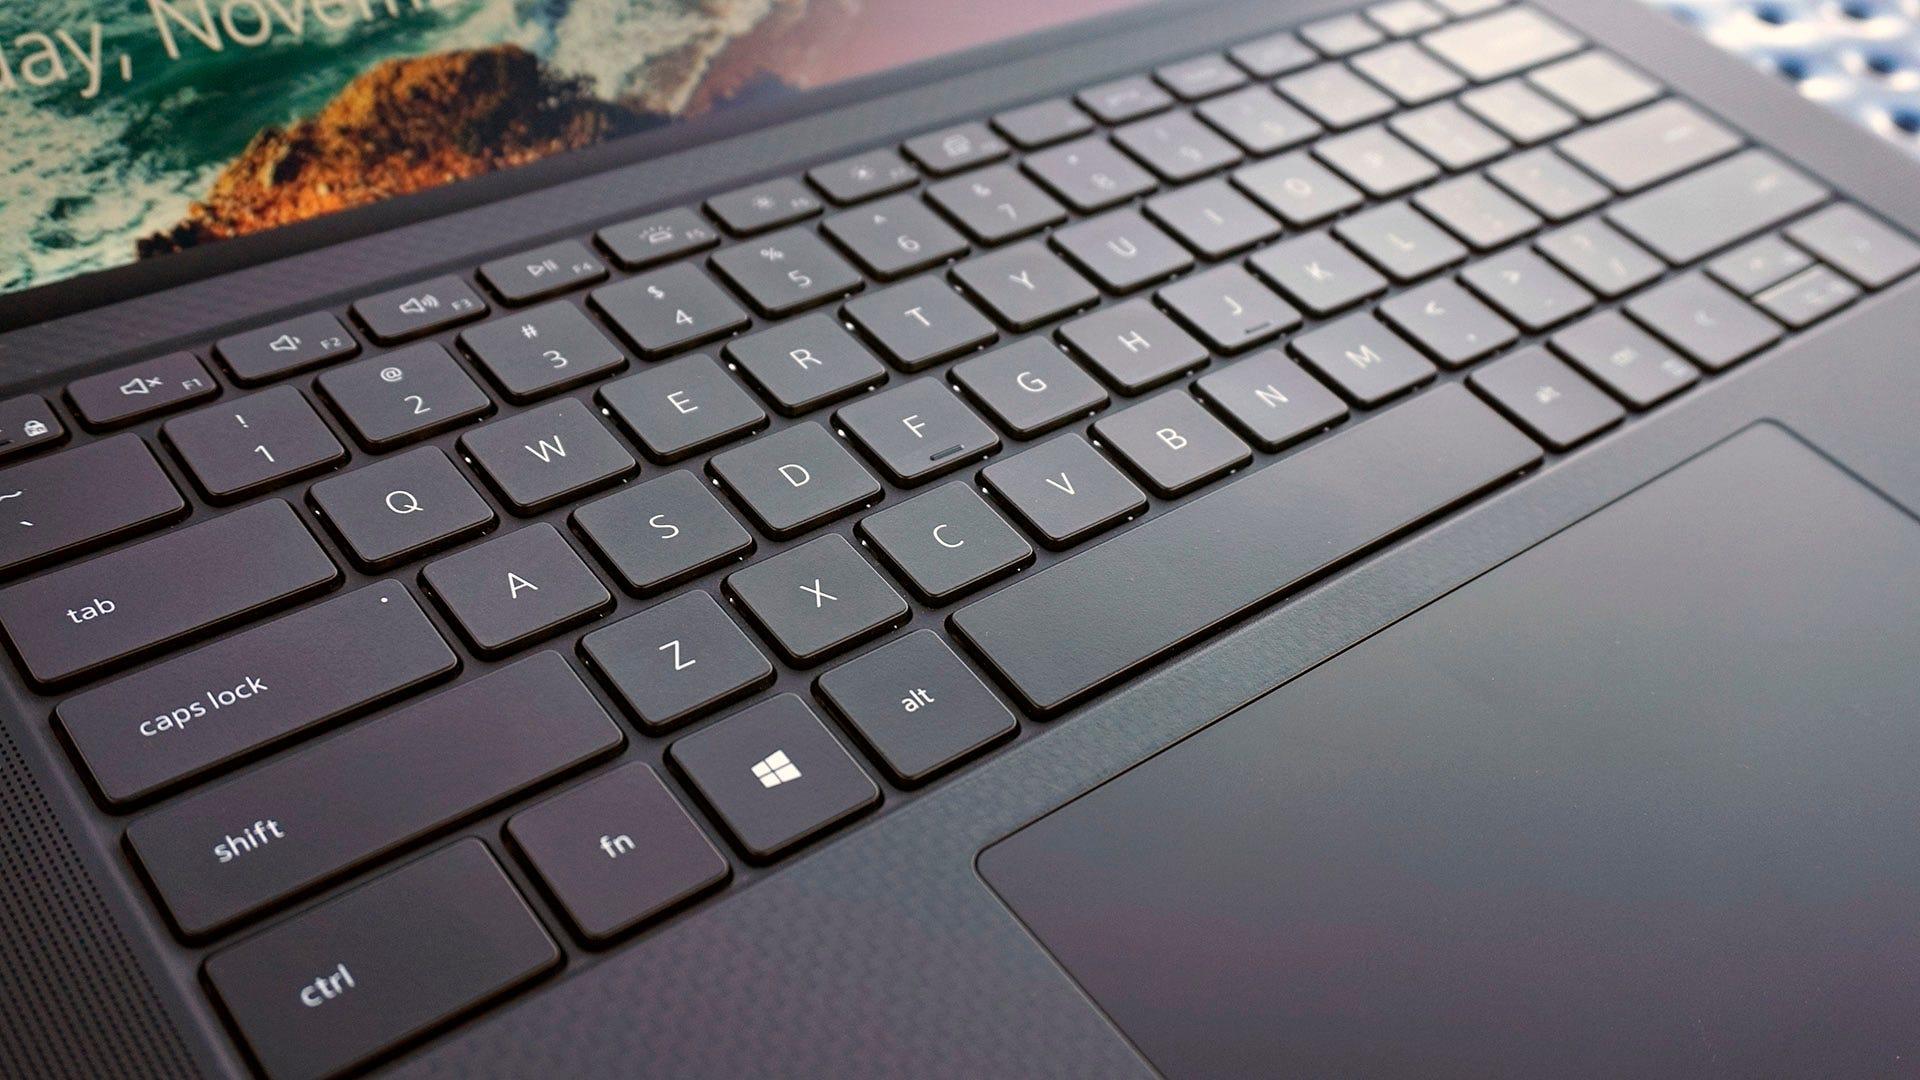 XPS 15 keyboard